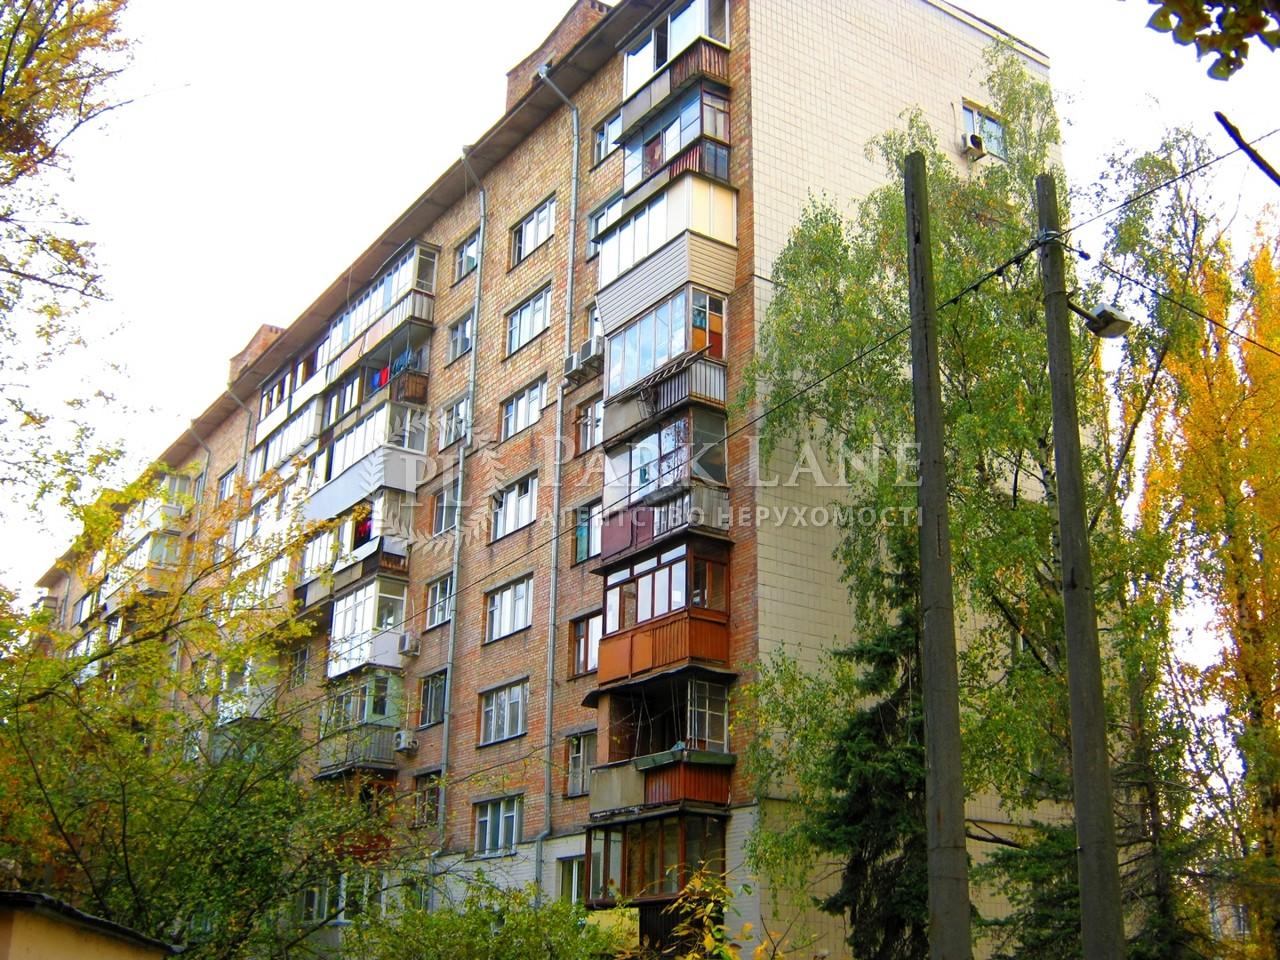 Квартира Новогоспитальная (Щорса пер.), 5, Киев, B-99247 - Фото 19